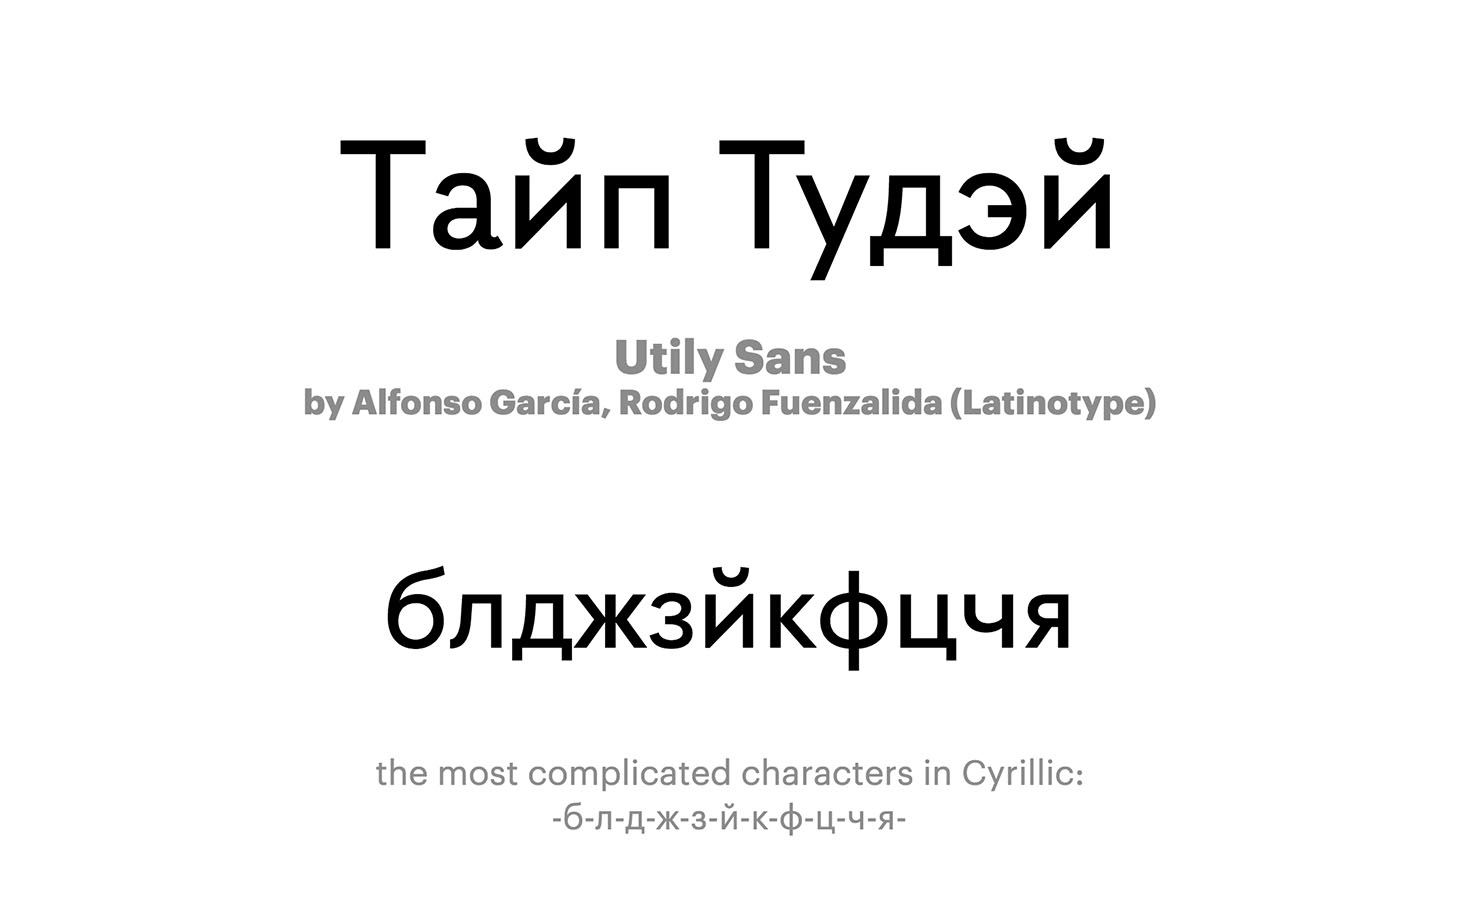 Utily-Sans